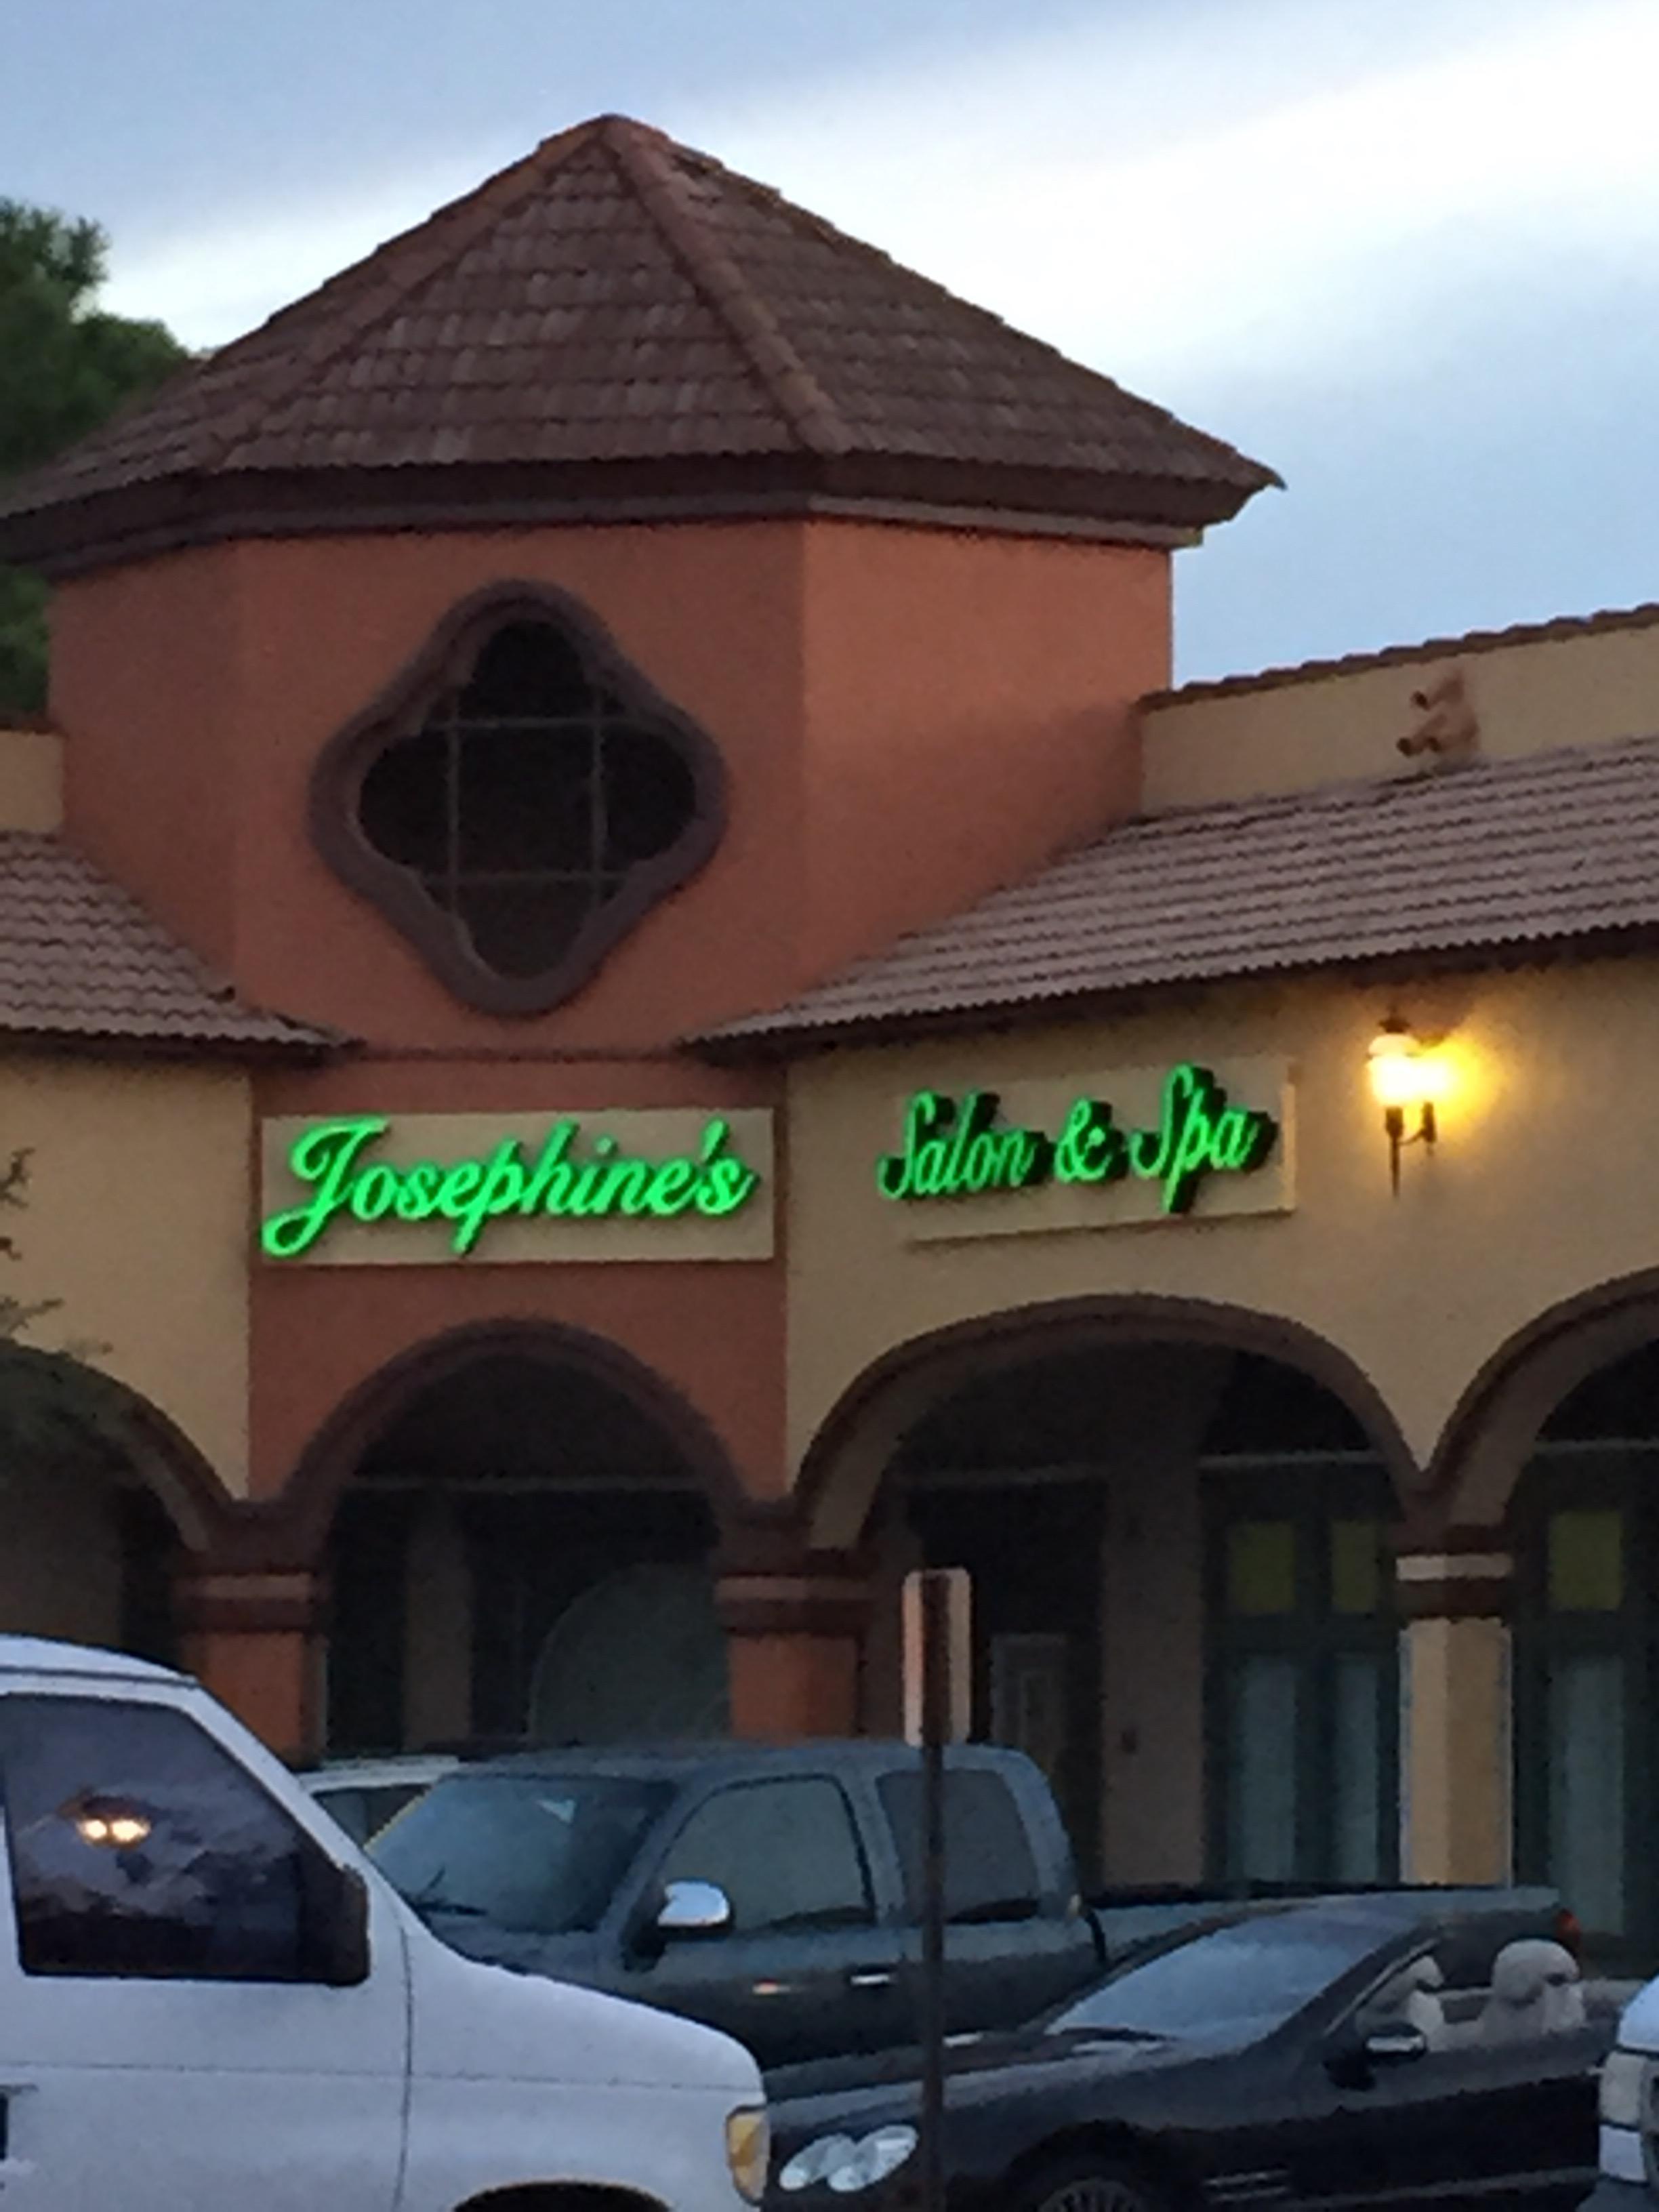 Josephine's Salon & Spa, Englewood FL